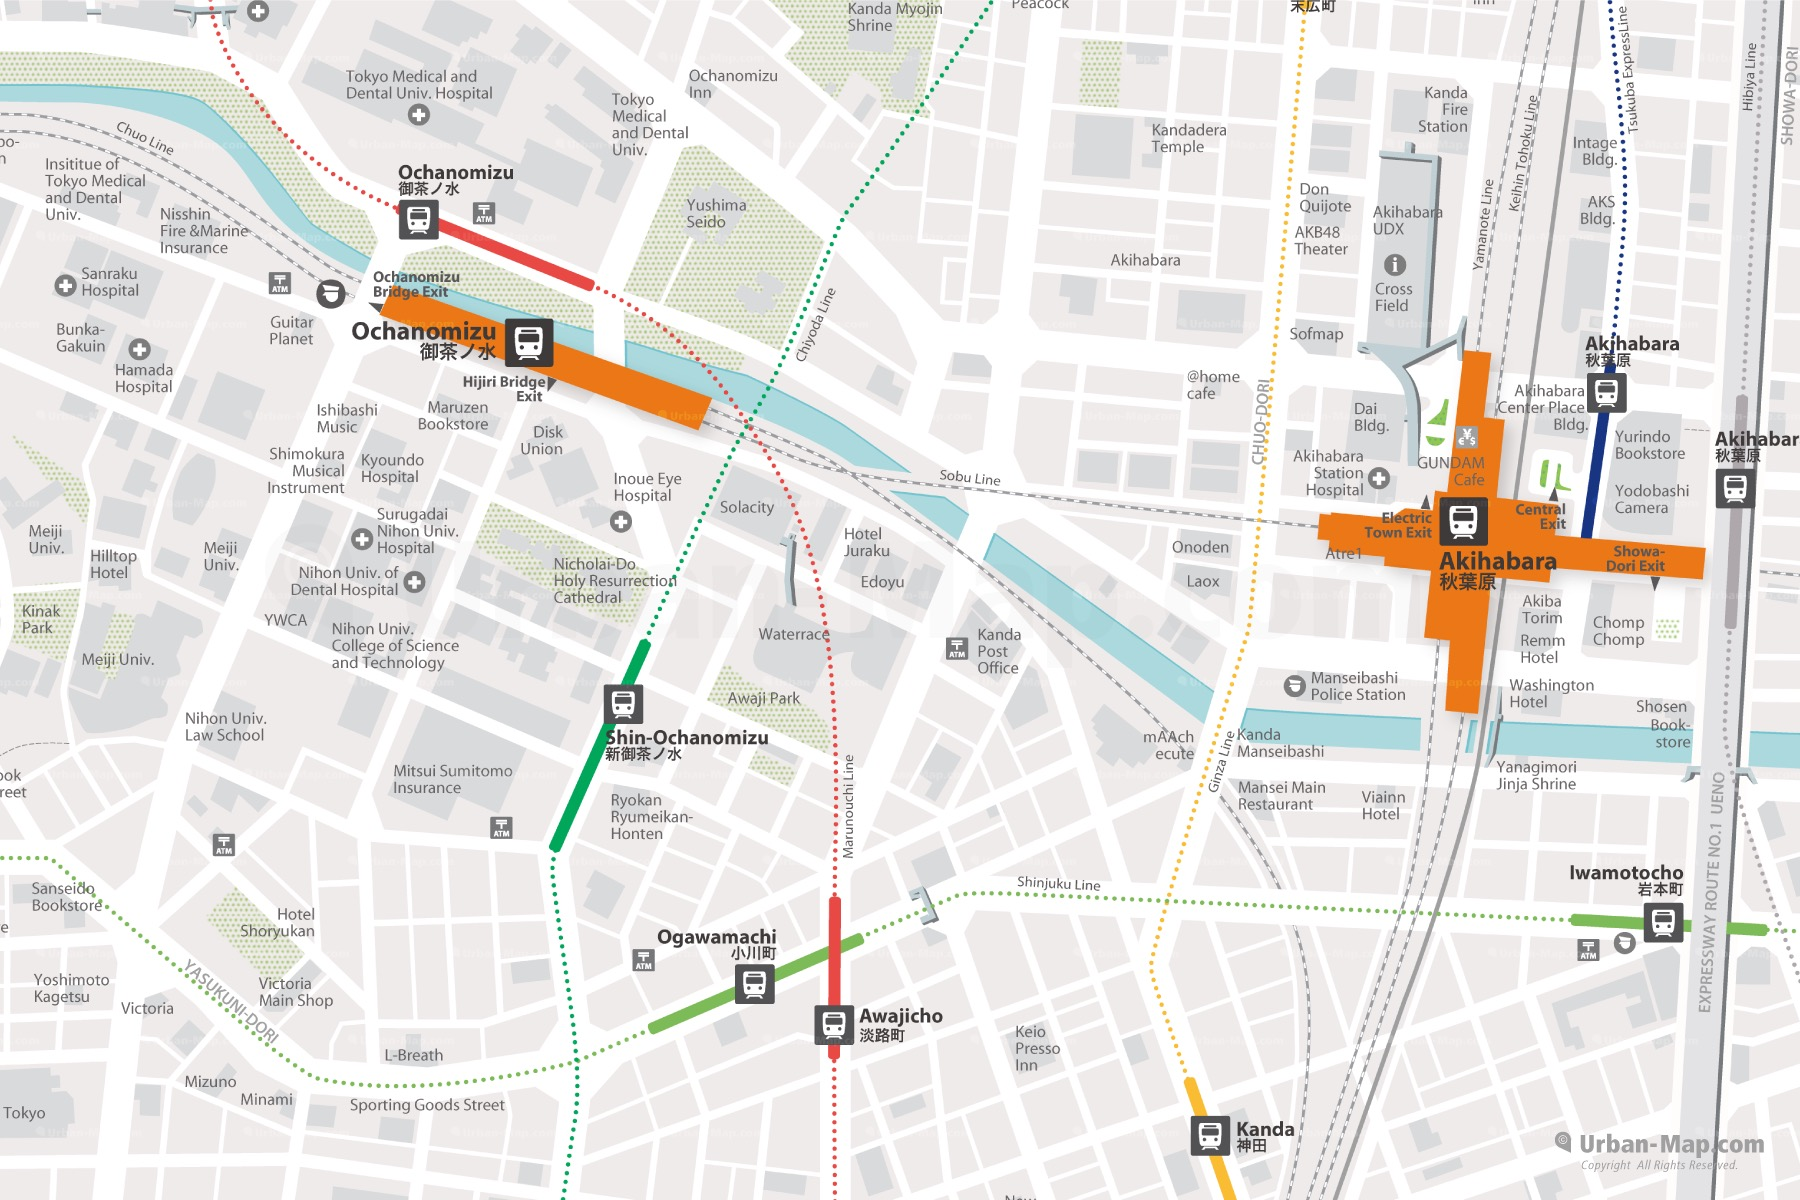 Tokyo Akihabara City Map shows Ochanomizu and Akihabara Station